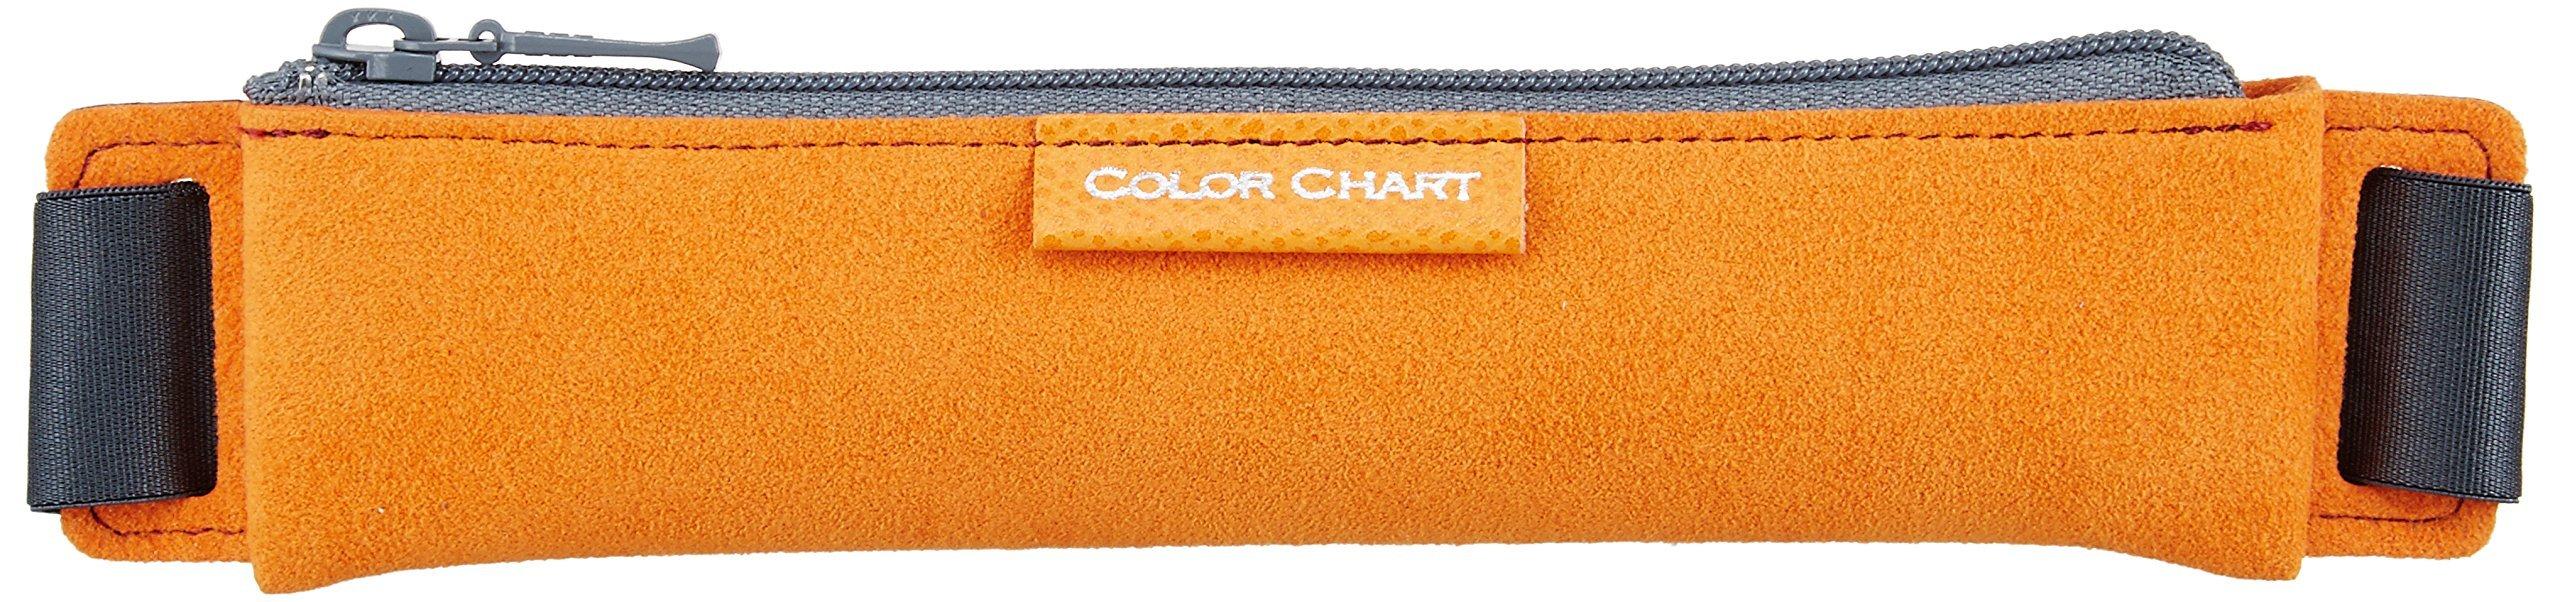 ITOYA Color Chart Ecsaine Notebook Band - Pen Case A5 Orange